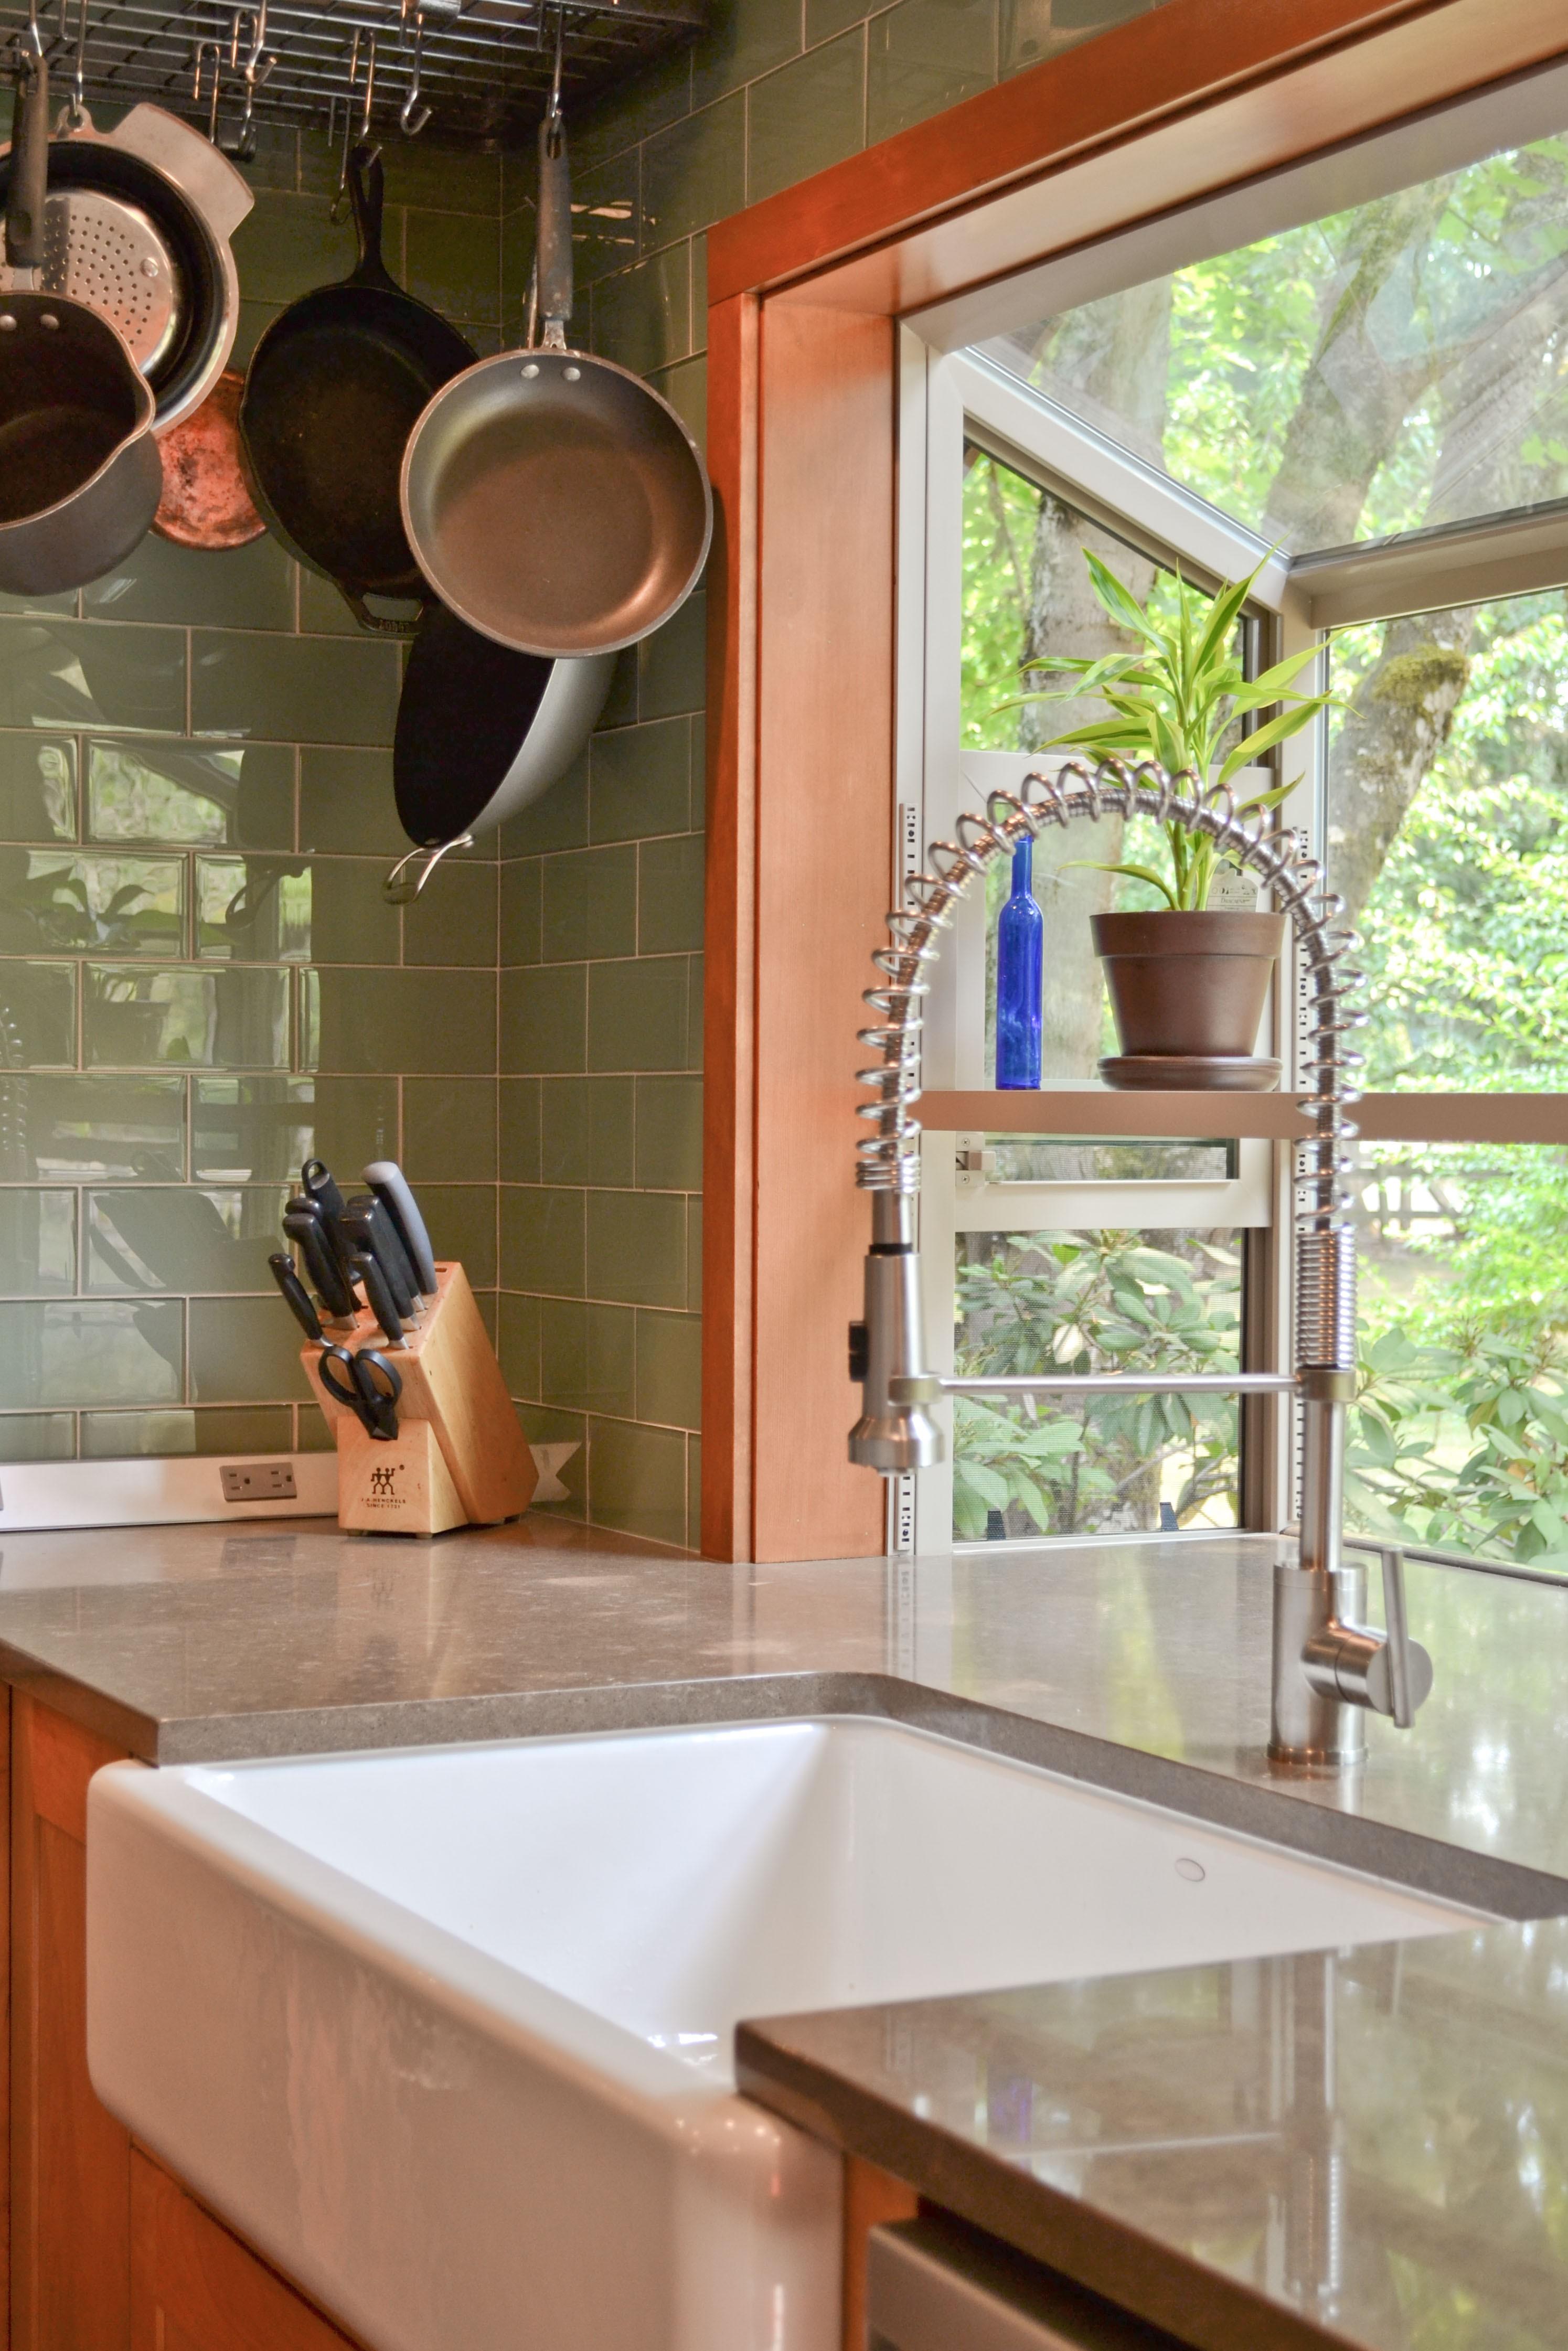 Big Kitchen Sink Deep At One End